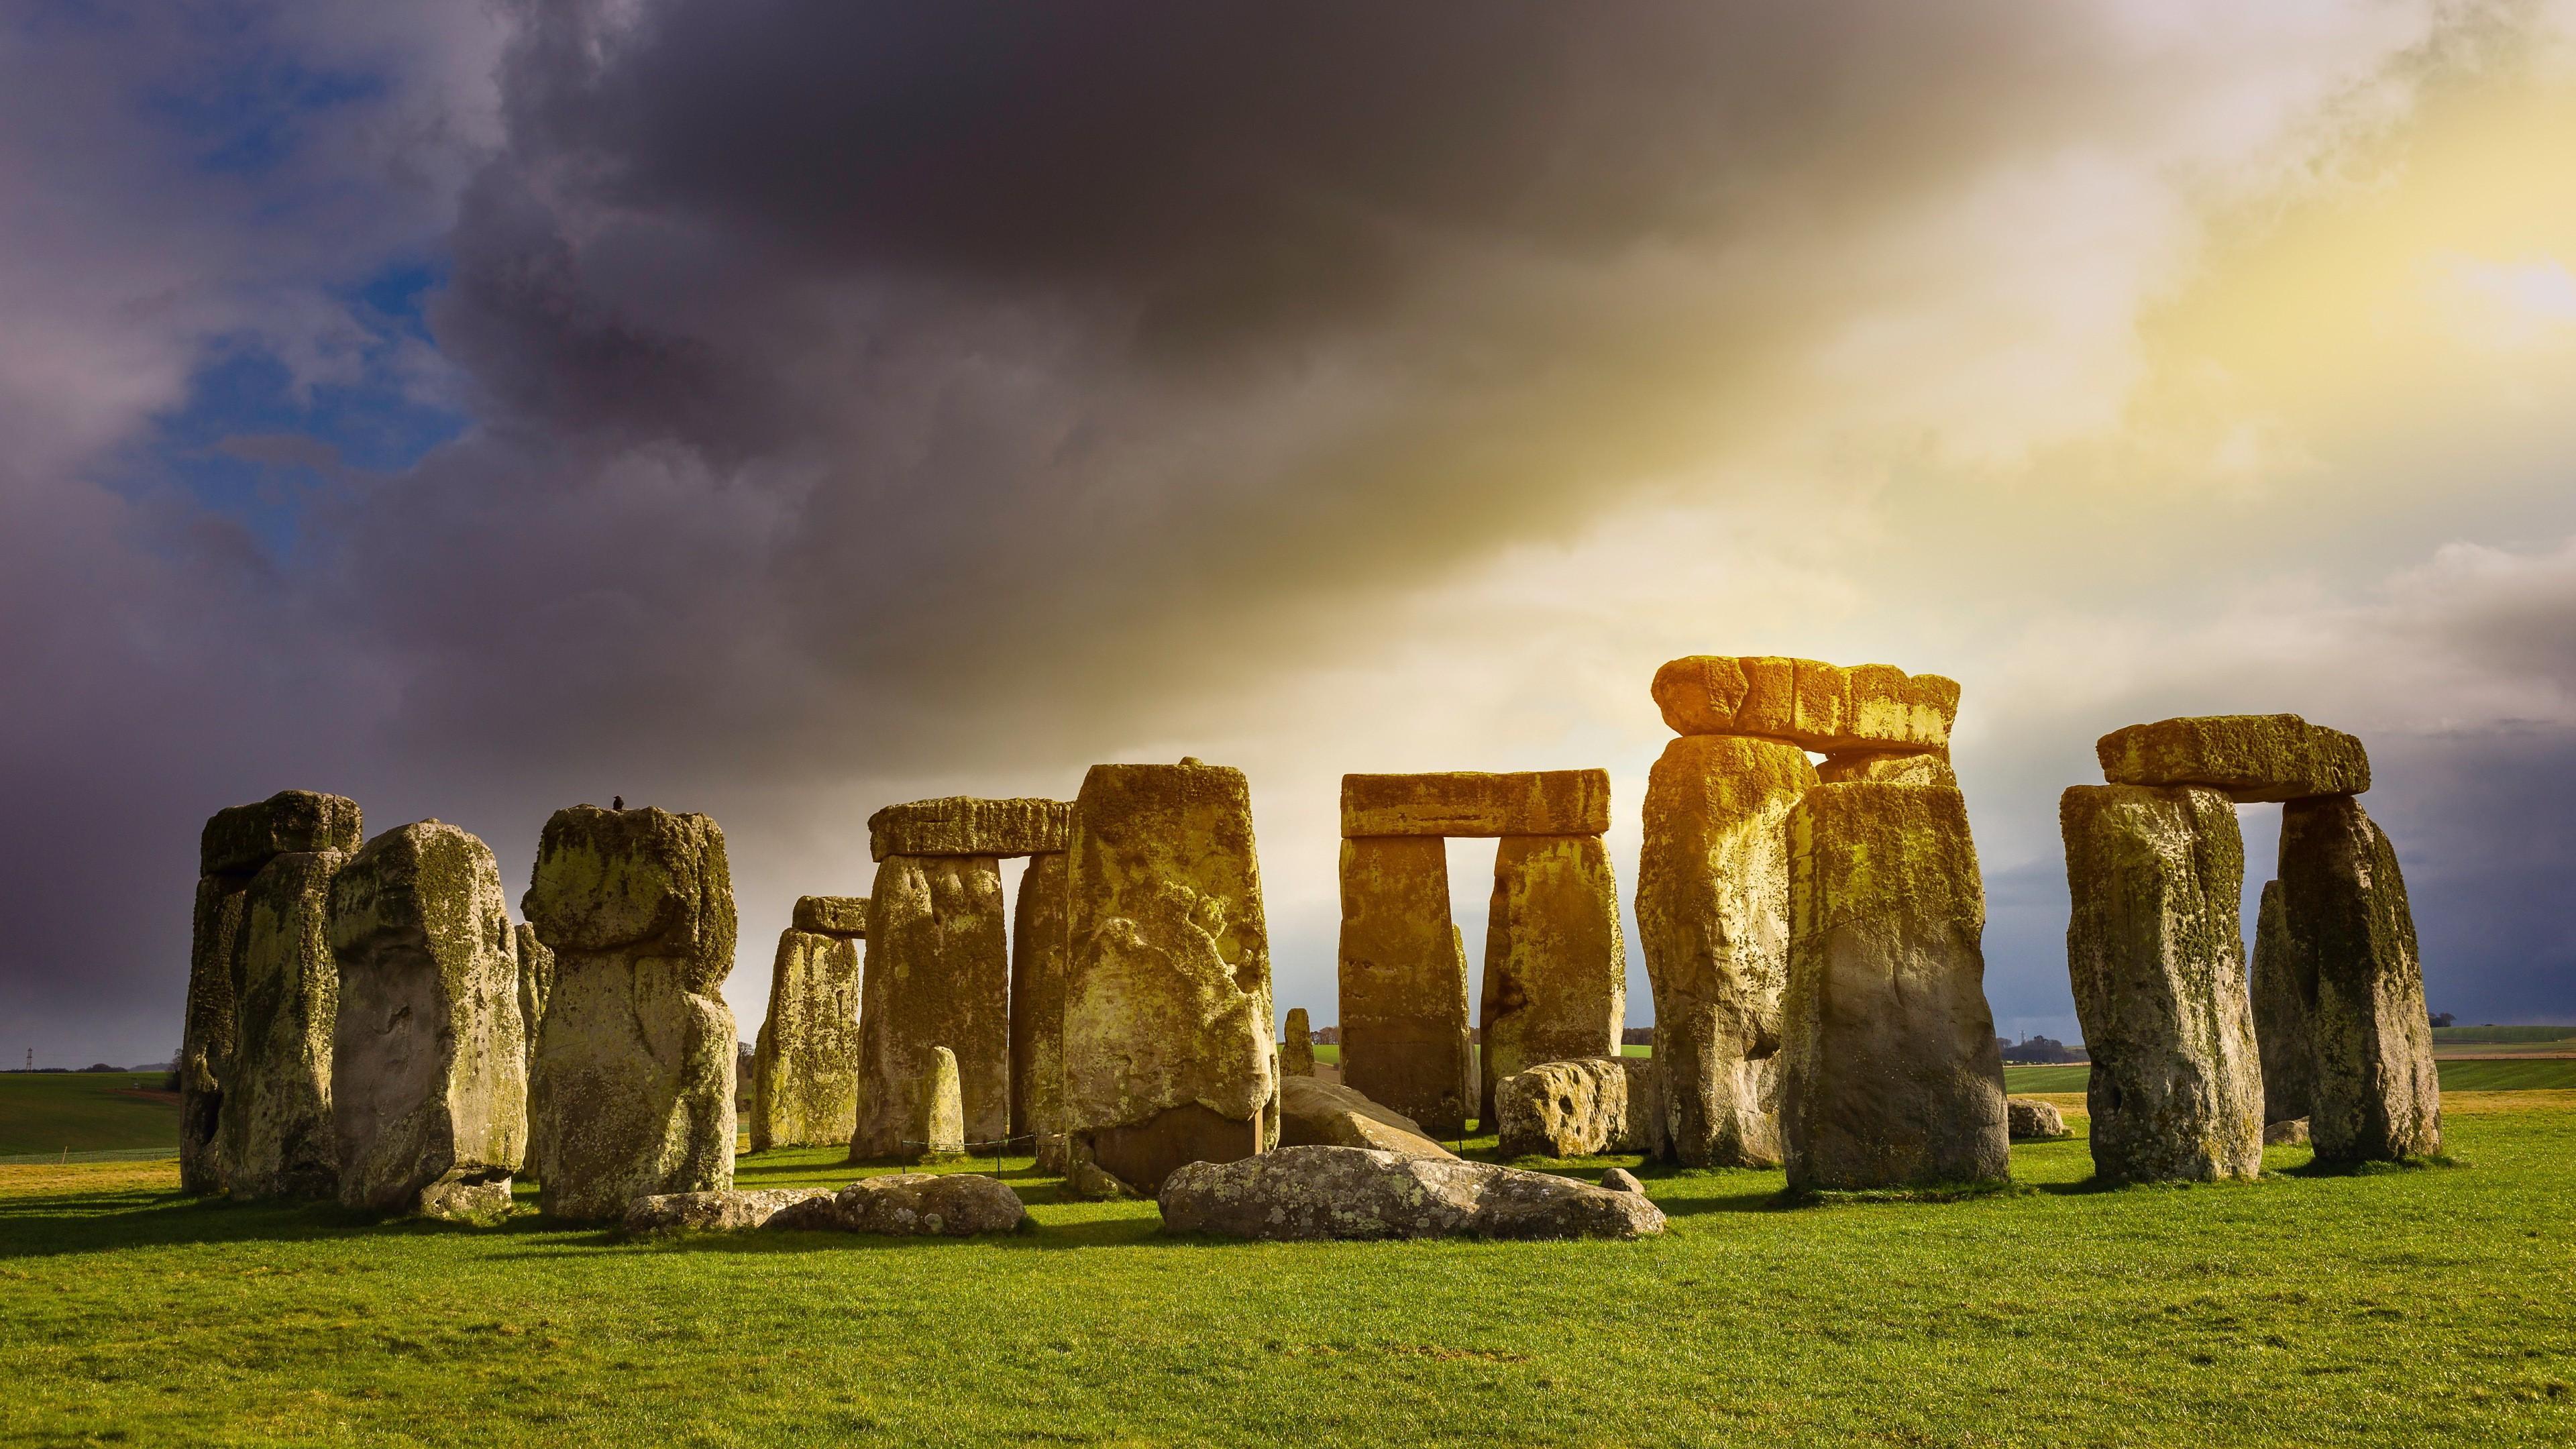 Famous Rock Group, Stonehenge, Wiltshire, England  № 715535 бесплатно